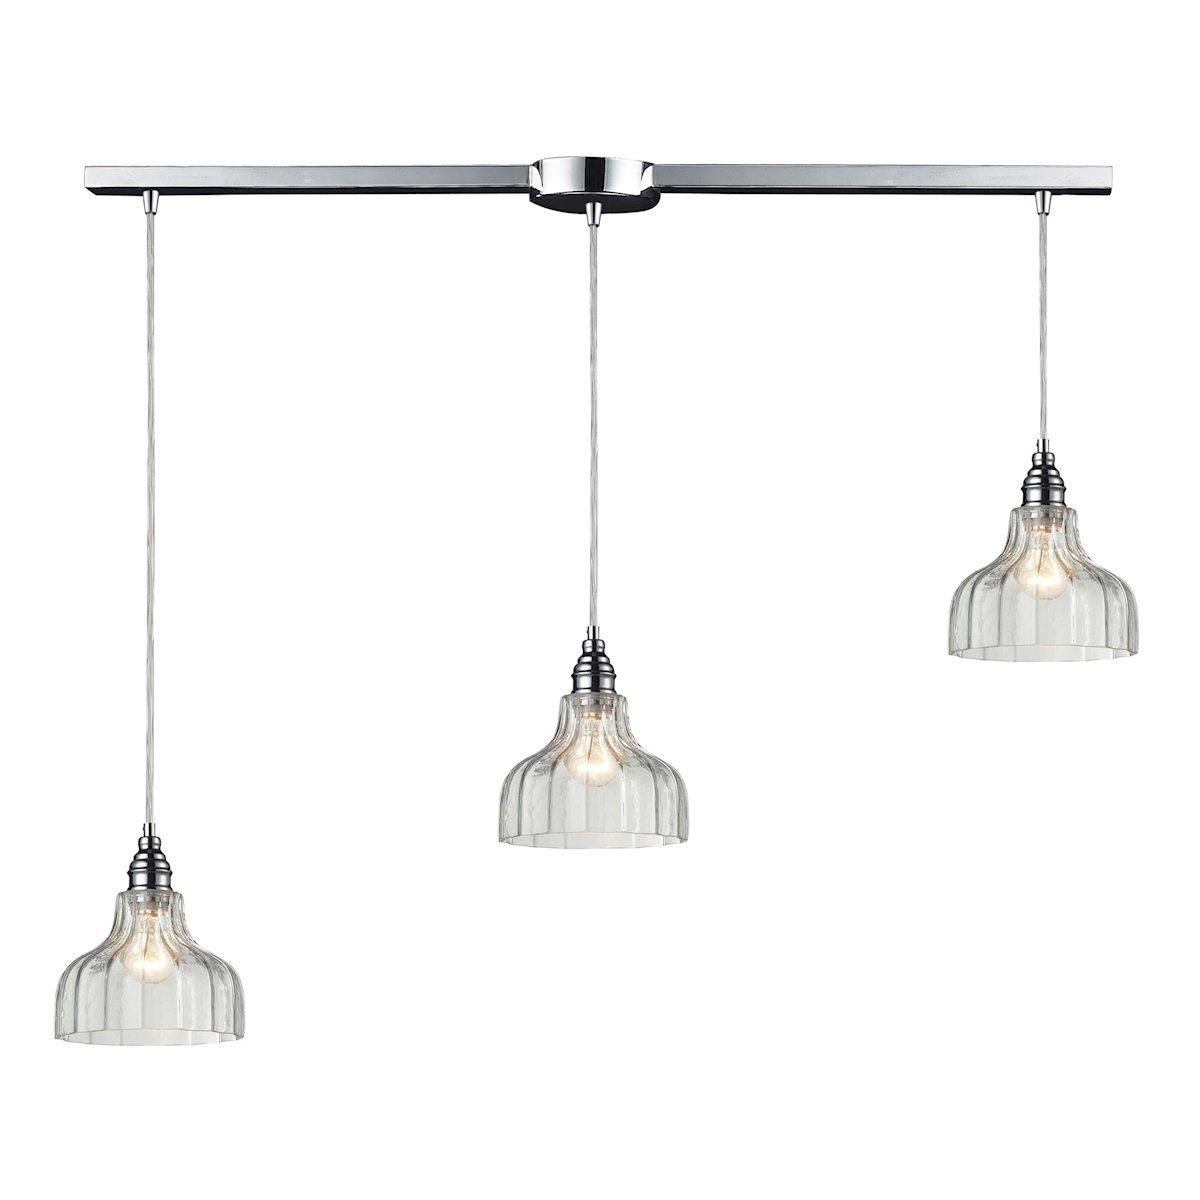 36 by 9-Inch Elk Lighting 46018//3L HGTV Danica 3-Light Pendant with Mercury Glass Shade Polished Chrome Finish